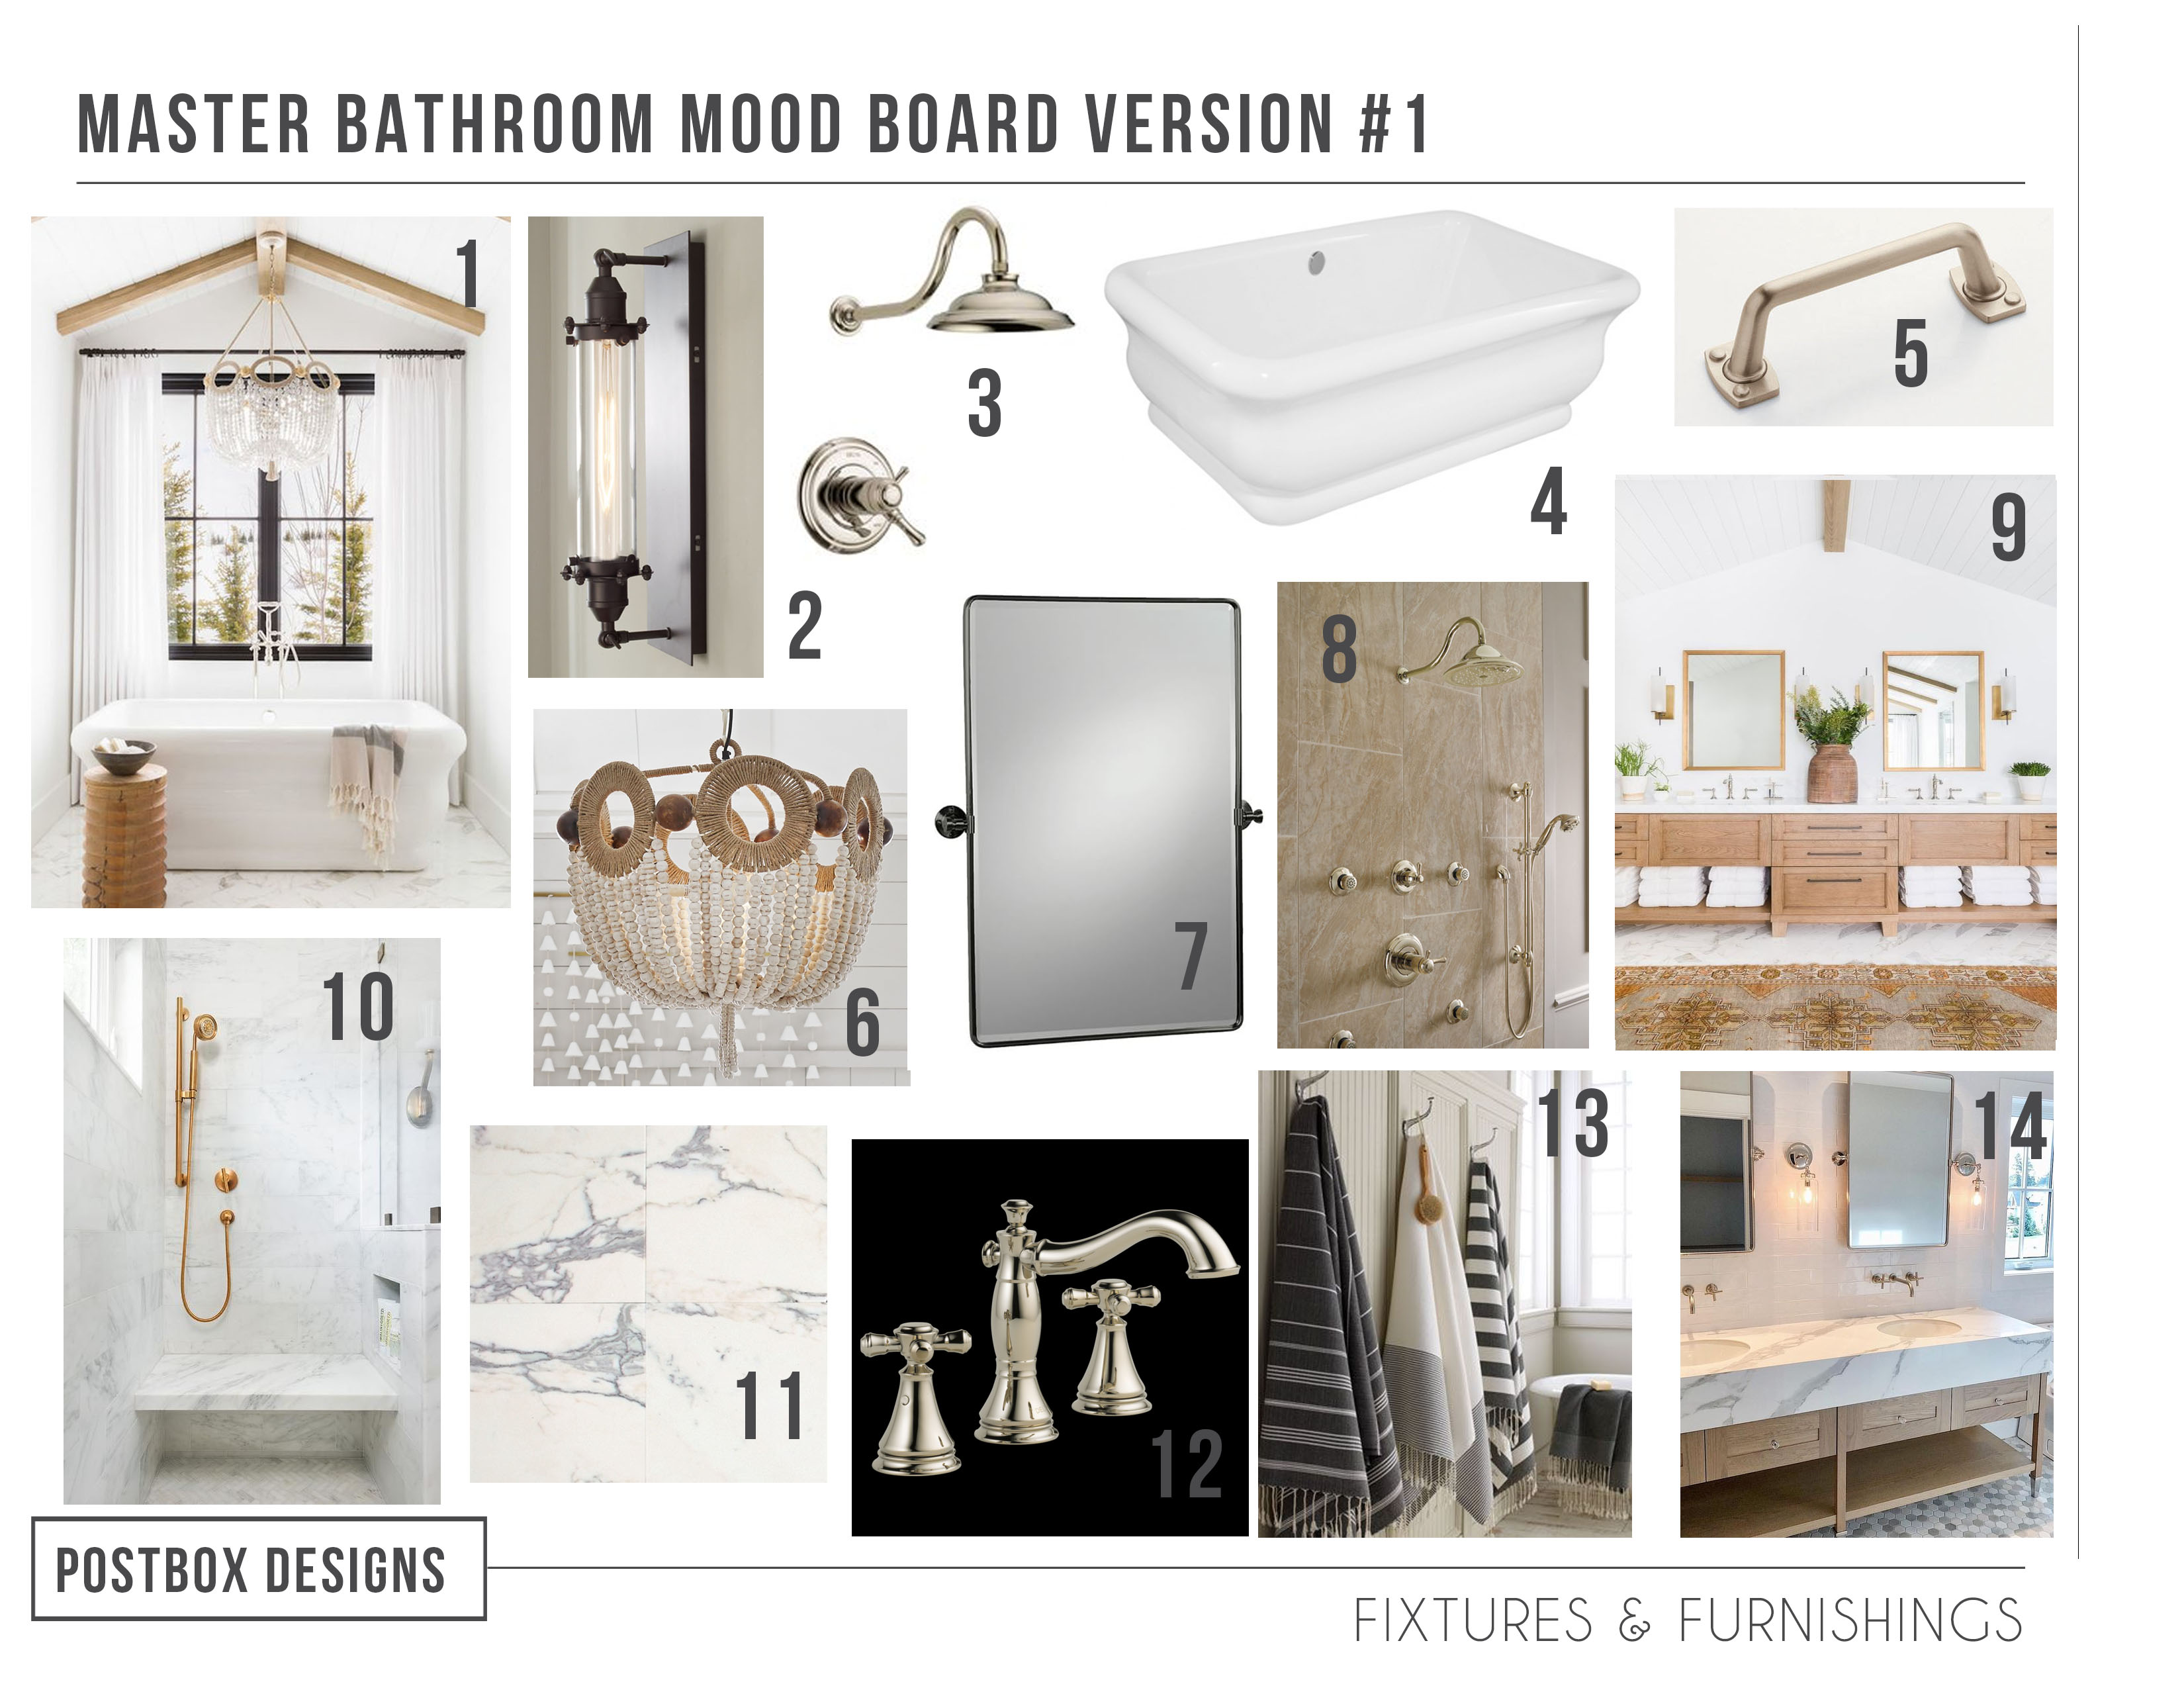 Designing A Bathroom 2 000 Miles Away A Rustic Elegant Bath Via E Design Postbox Designs